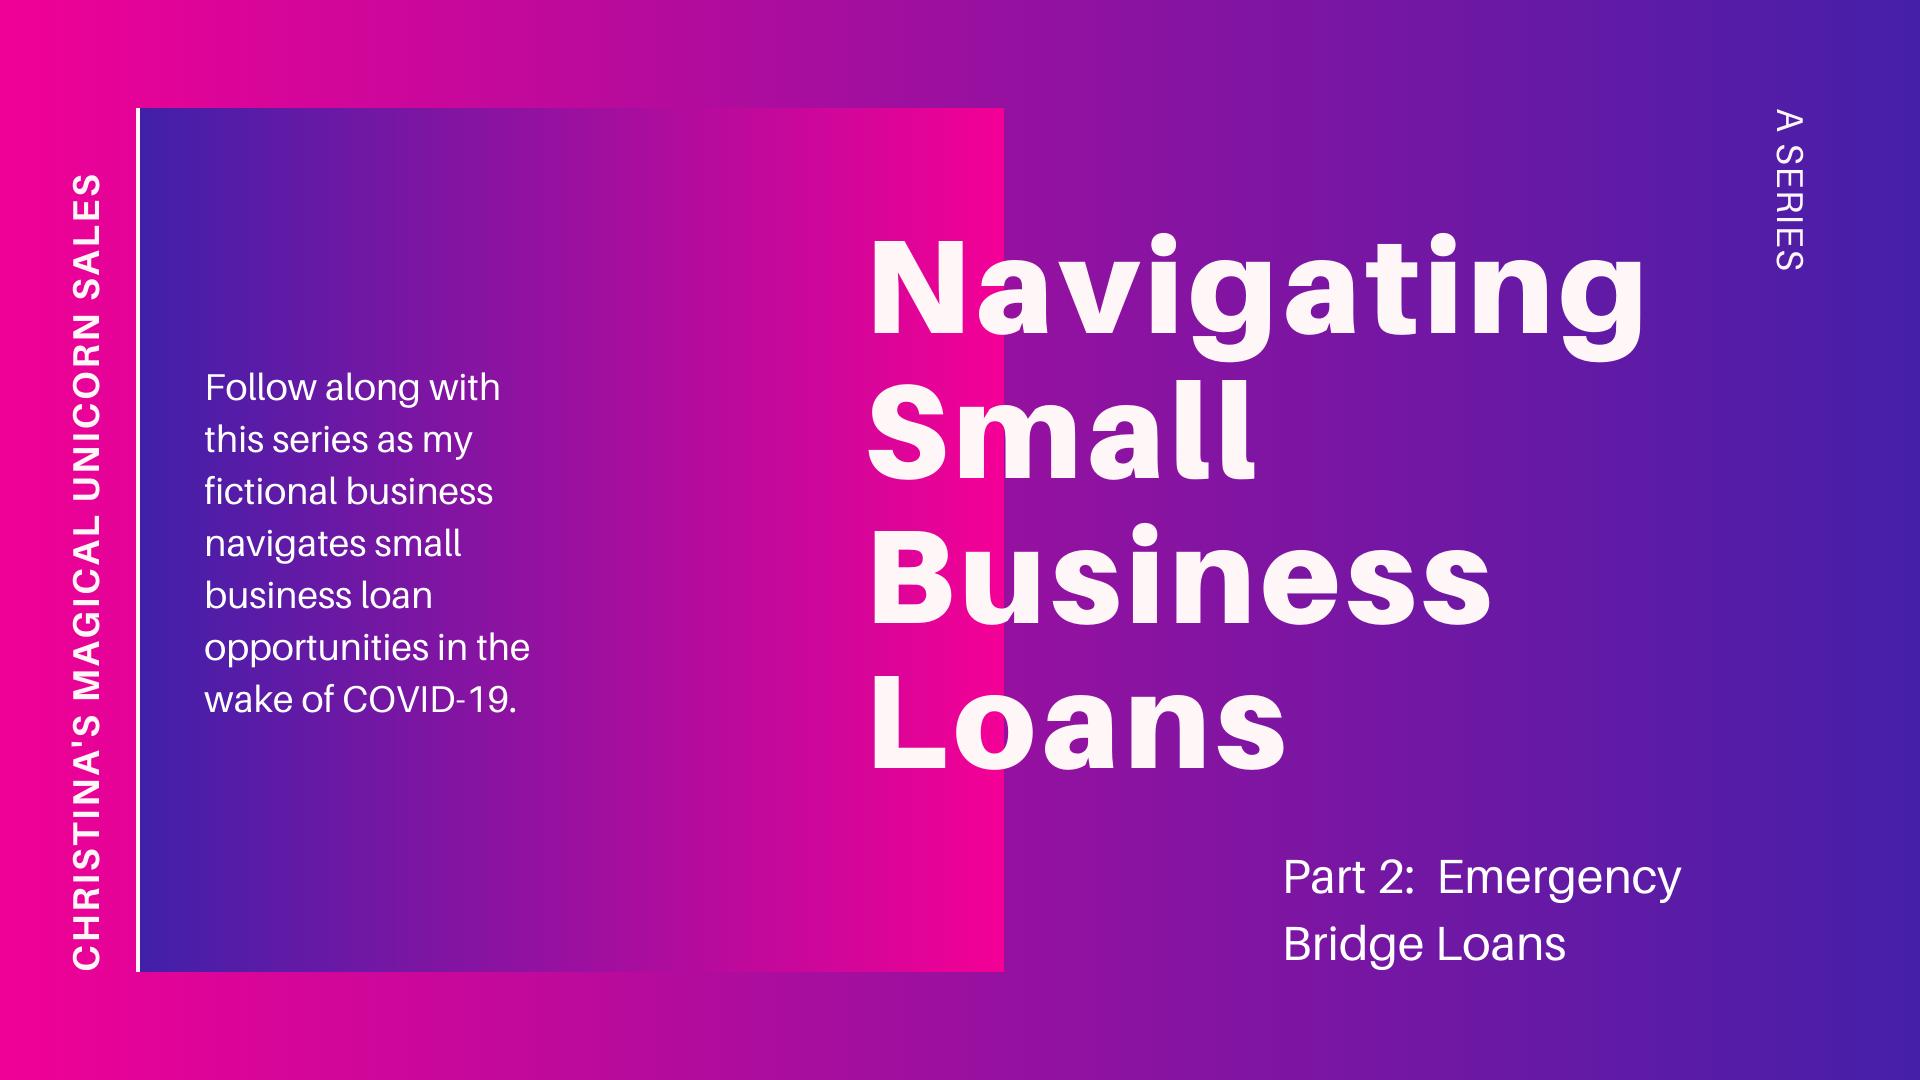 Navigating Small Business Loans, Part 2